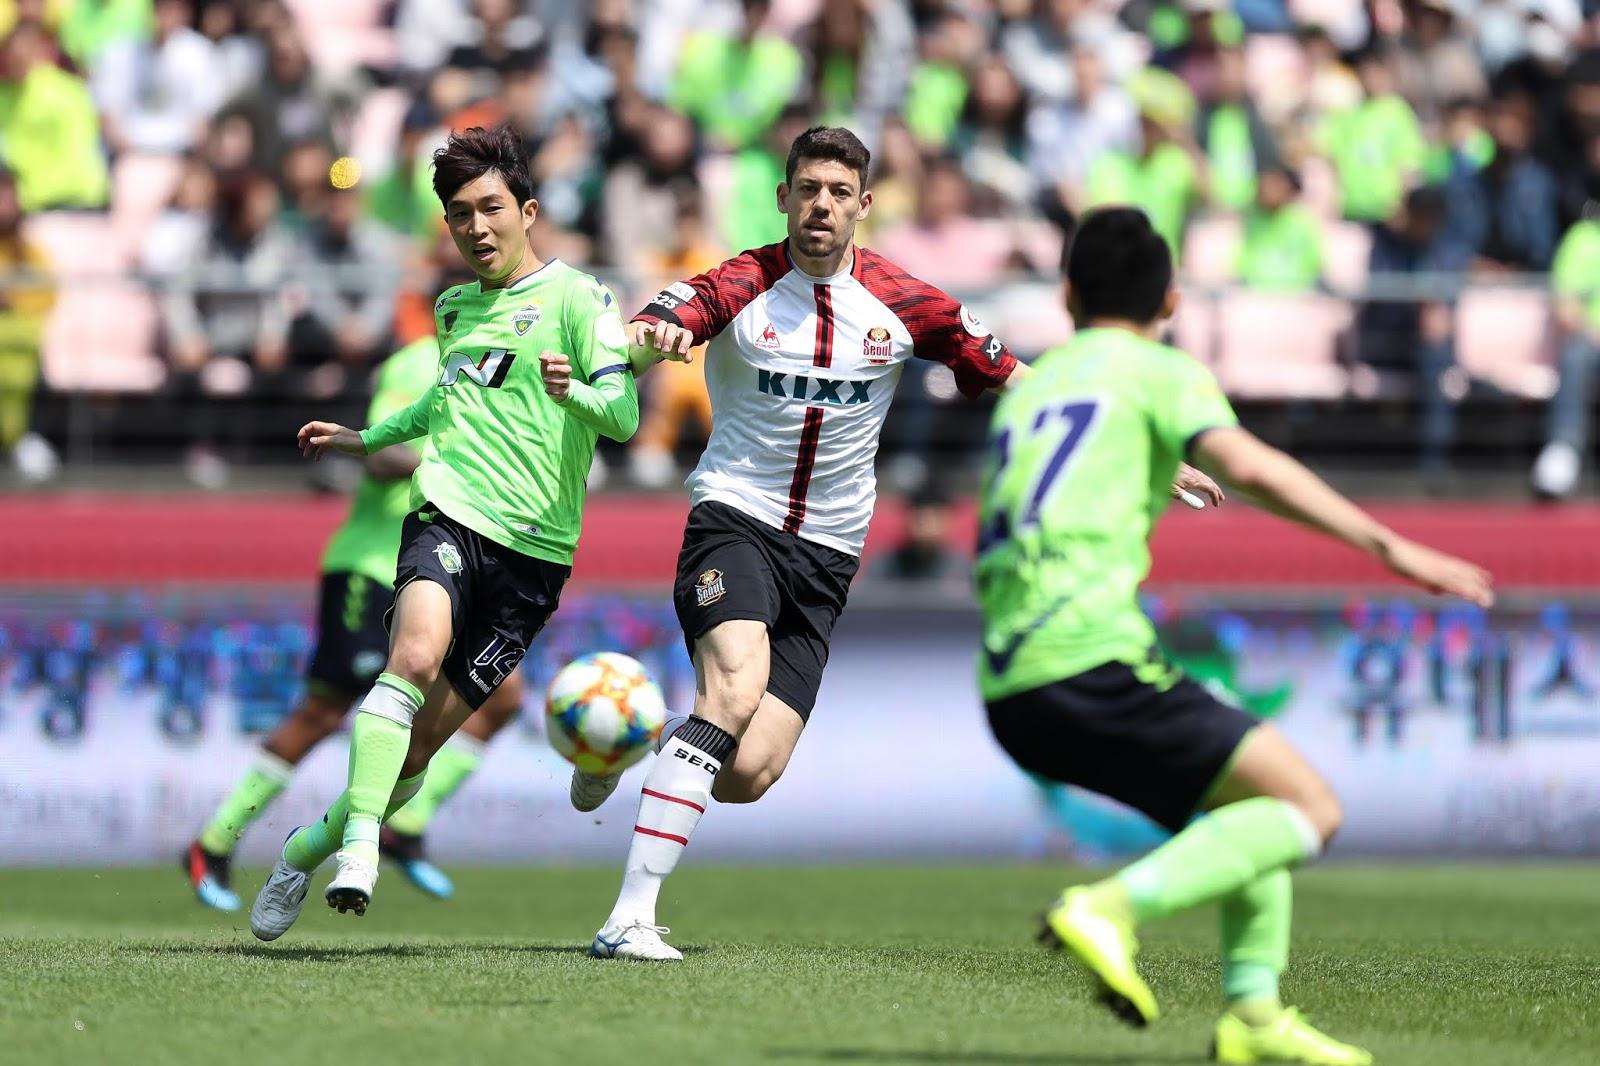 Preview: FC Seoul vs Jeonbuk Hyundai Motors K League 1 Round 22